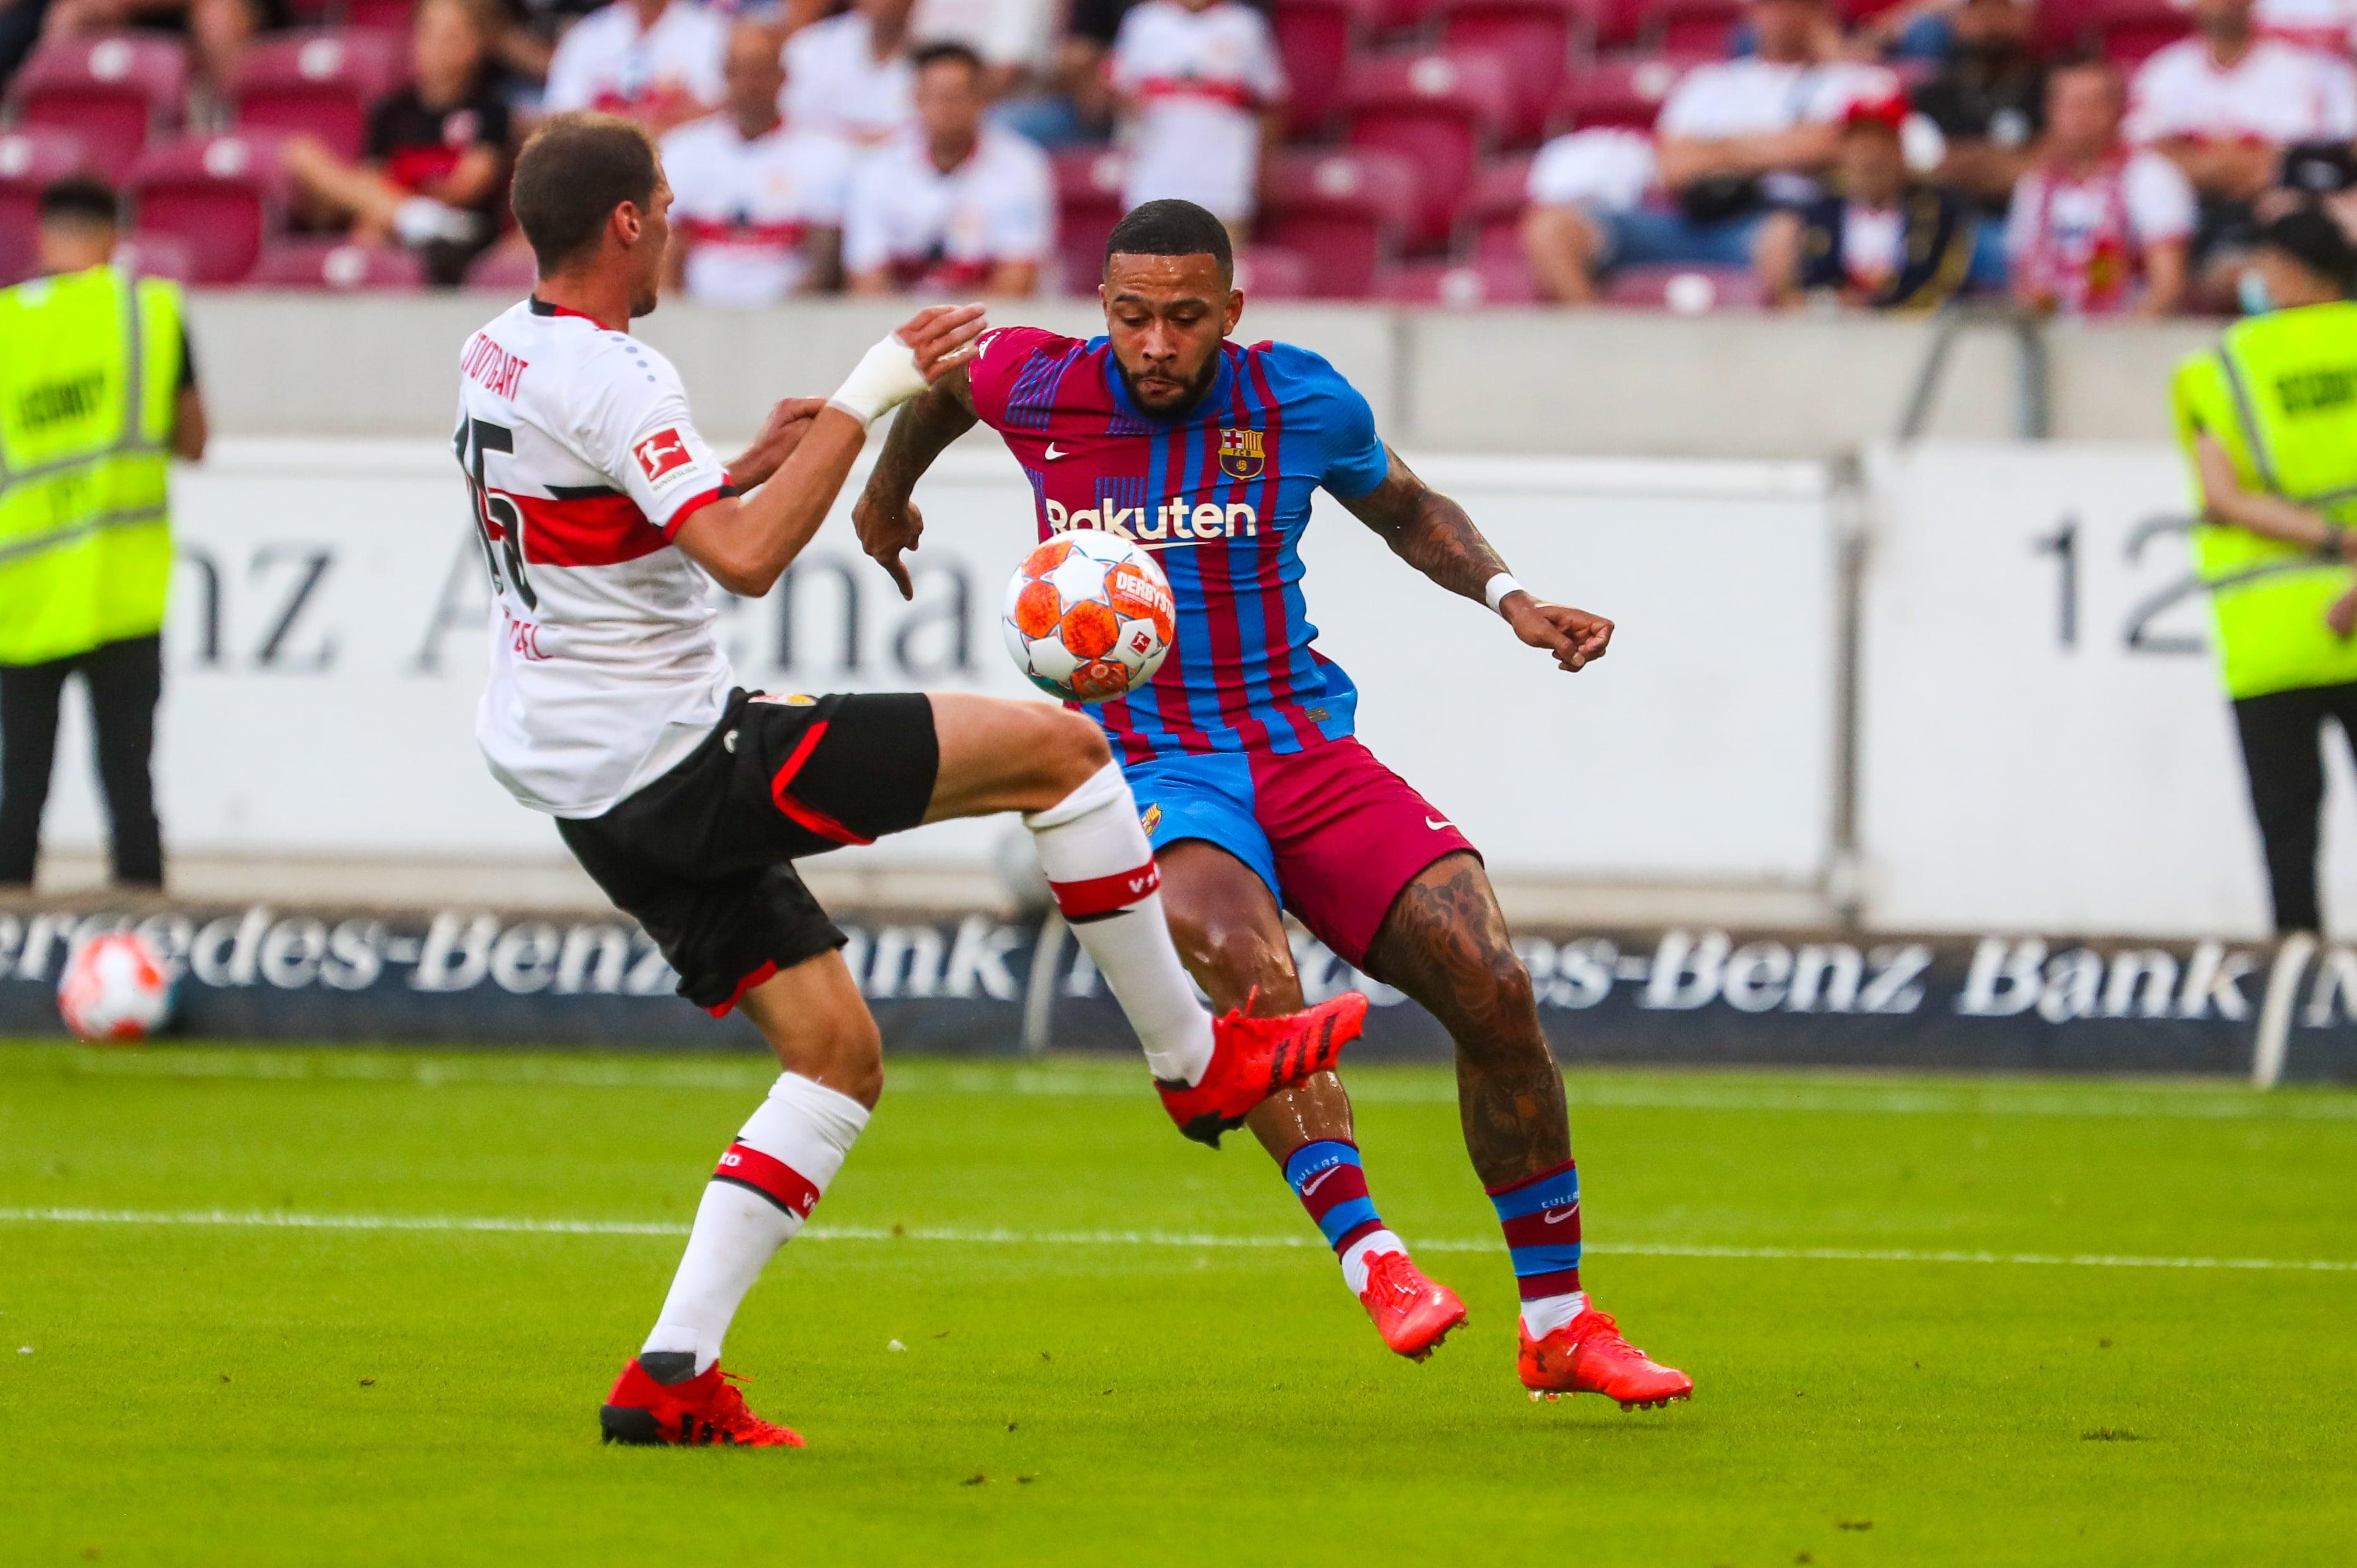 Spanish football evening headlines: Memphis inspires Barcelona to VfB Stuttgart, Atletico edge past Wolfsburg and Pique backs Messi